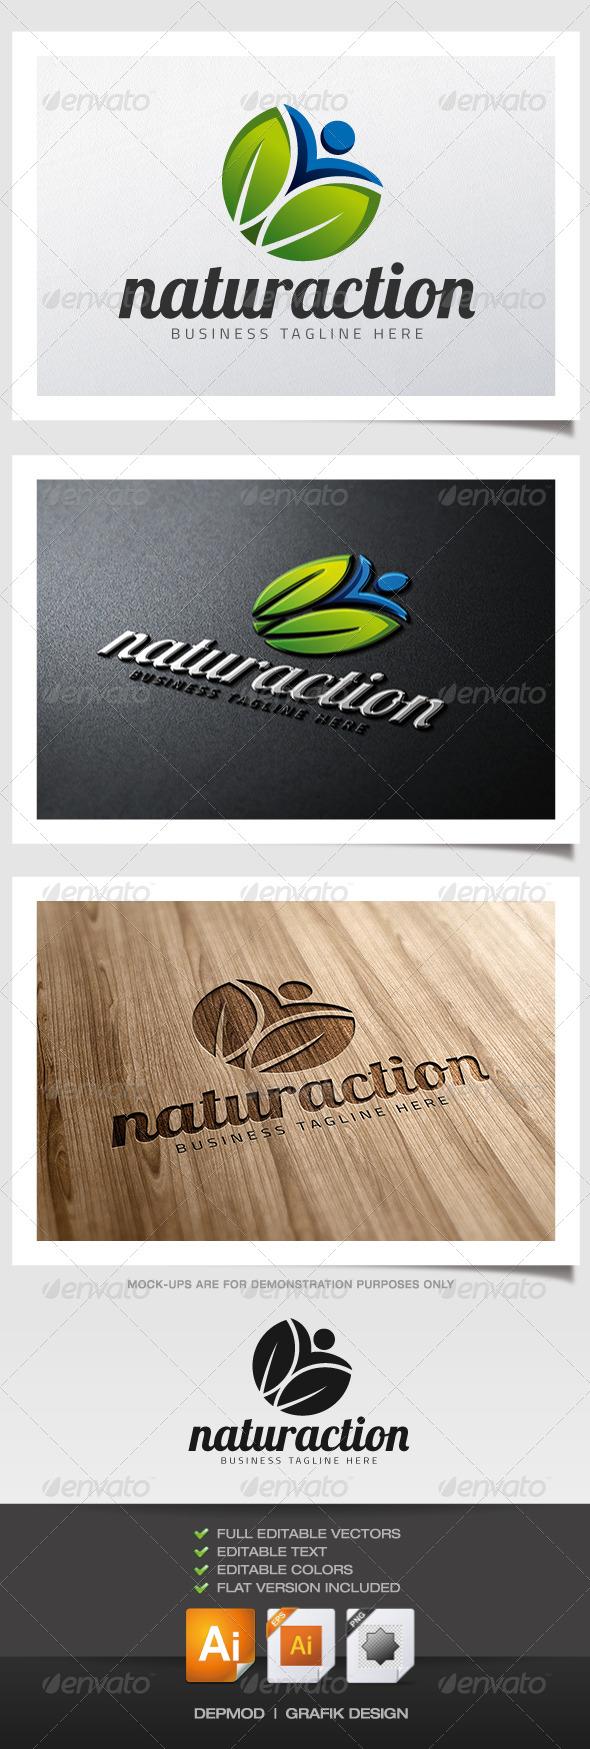 Naturaction Logo - Symbols Logo Templates